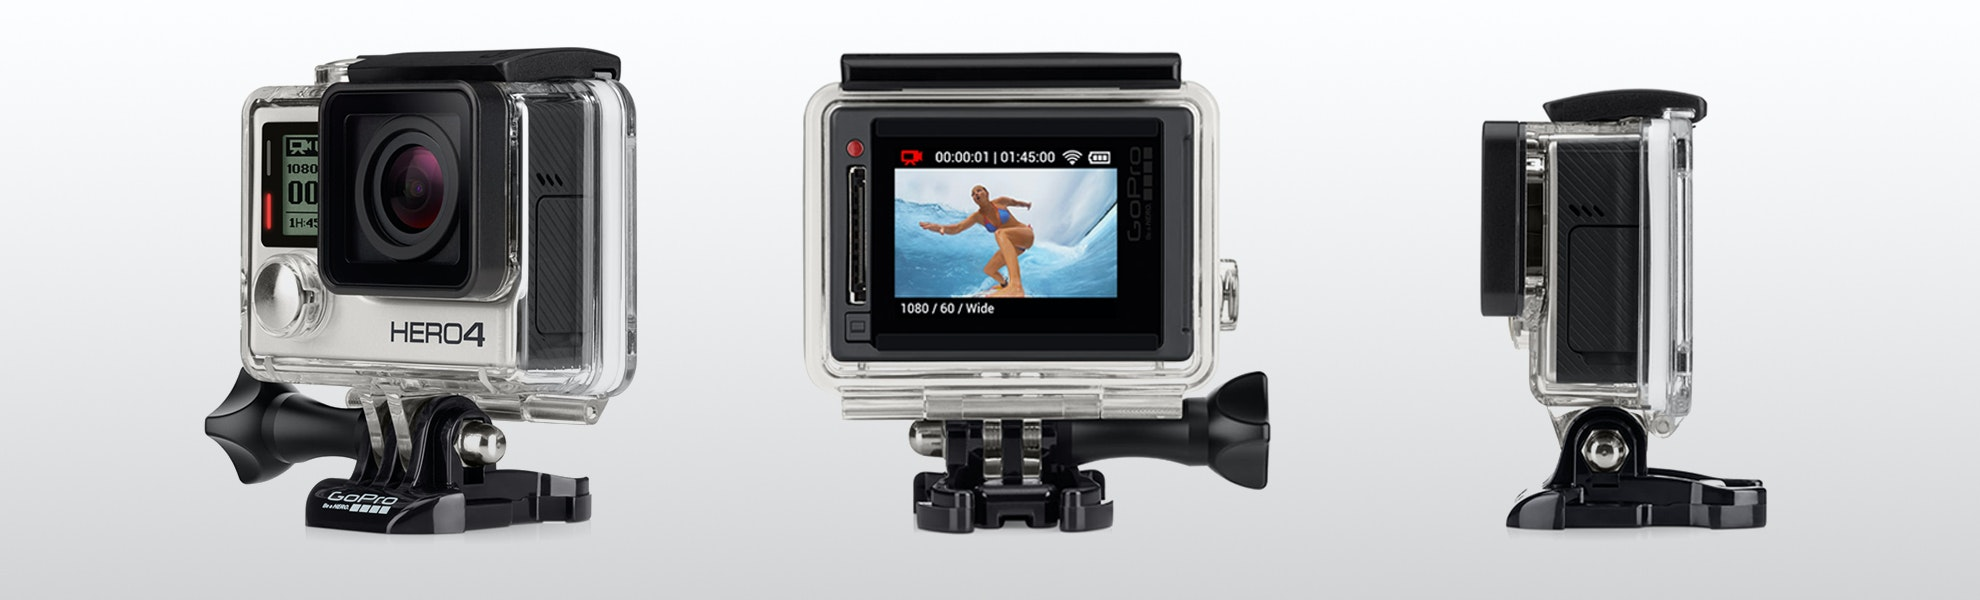 GoPro Hero 4 Silver Action Camera